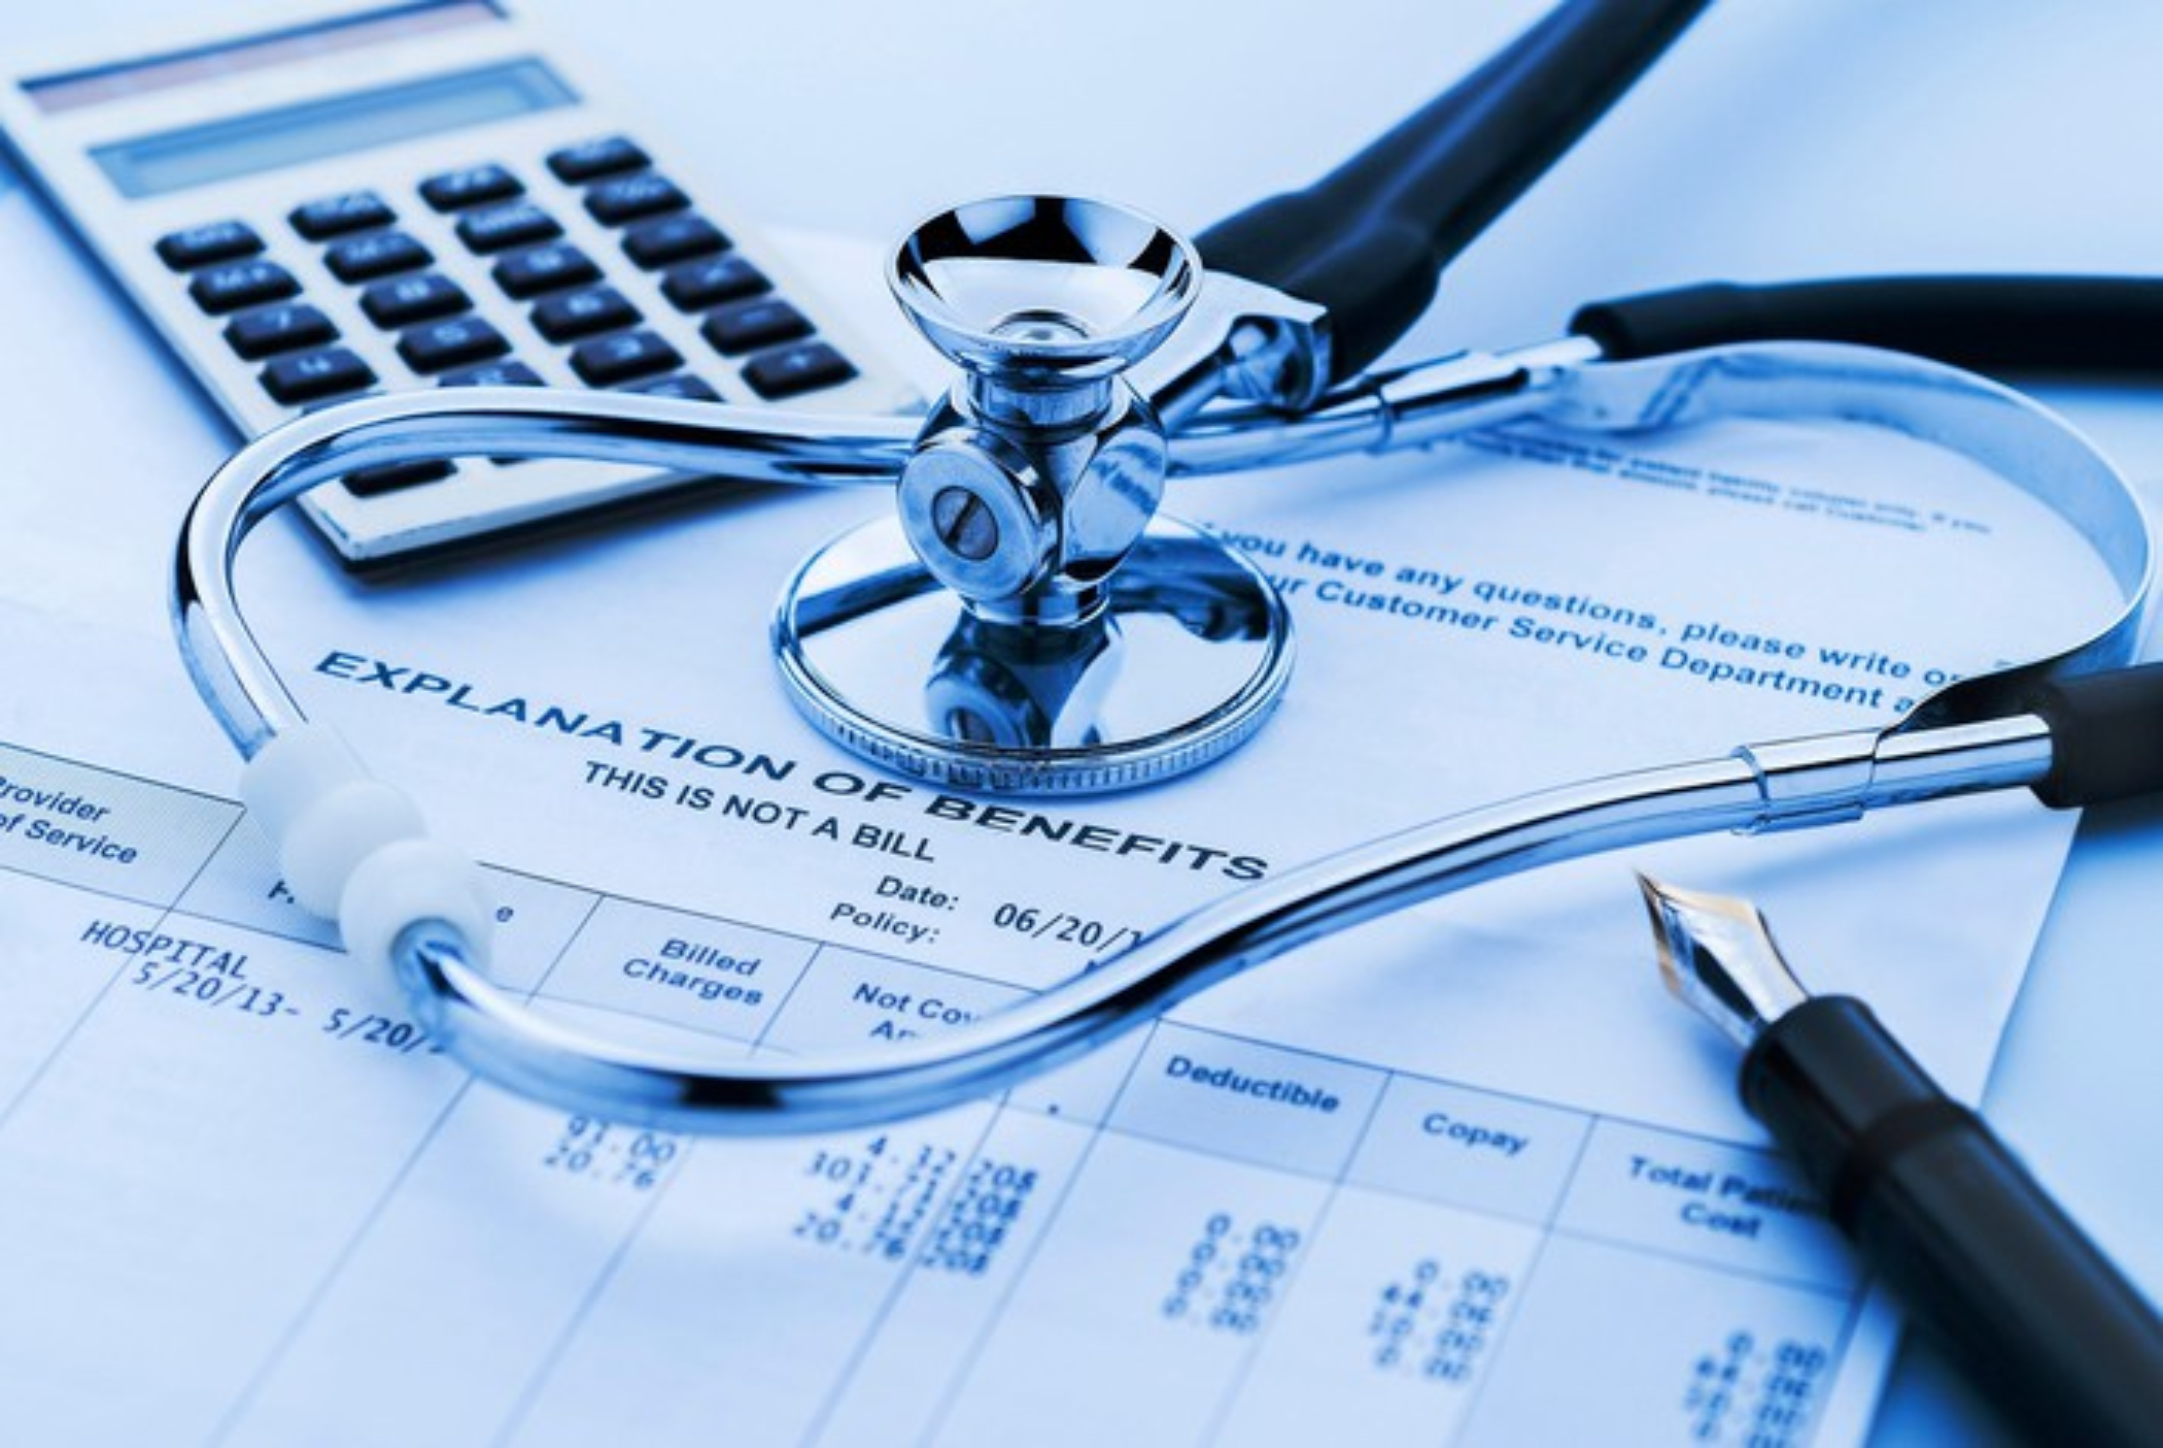 Health-insurance benefits sheet under a stethoscope.